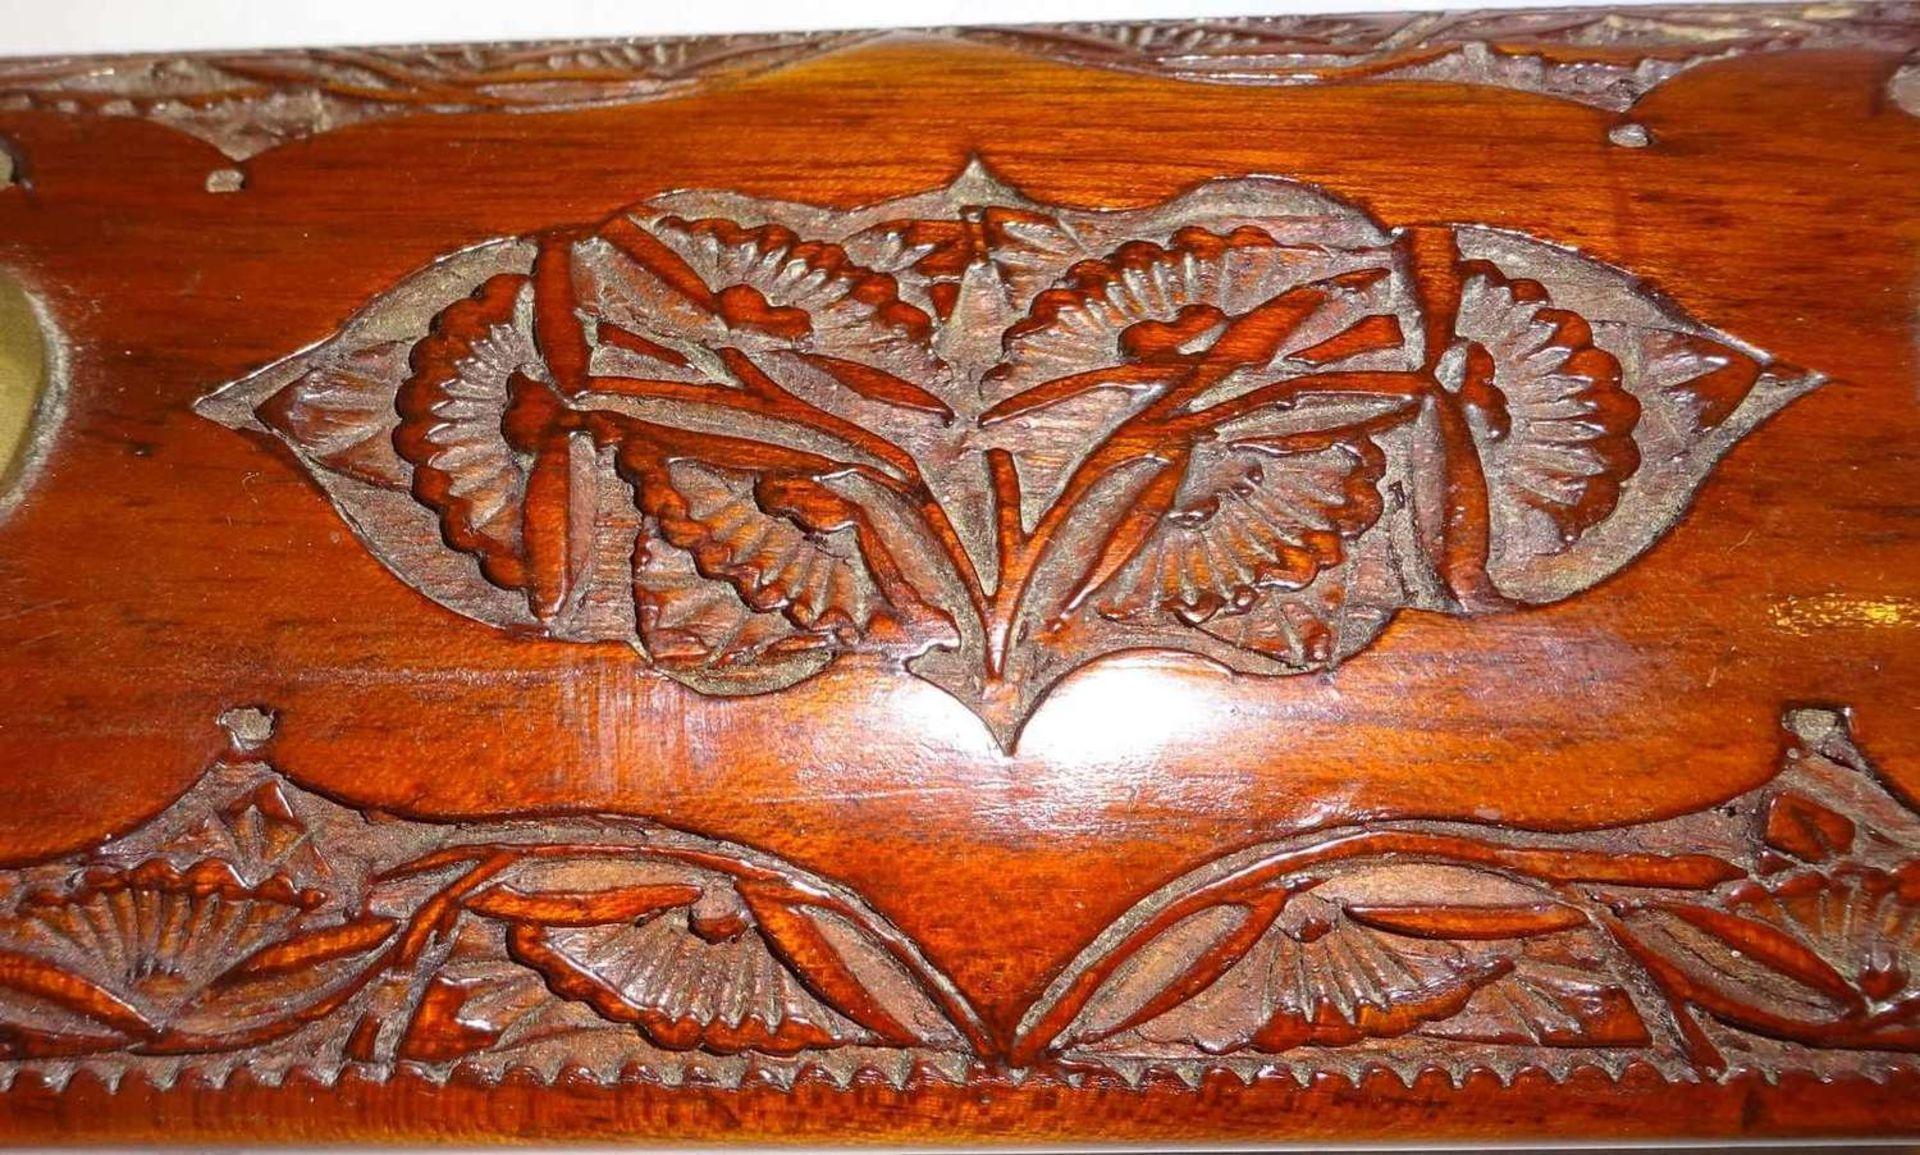 handgearbeitetes Tranchierbesteck, Messing/Holz. Indien, sehr guter Zustand. Länge ca. 43 cm - Image 2 of 3